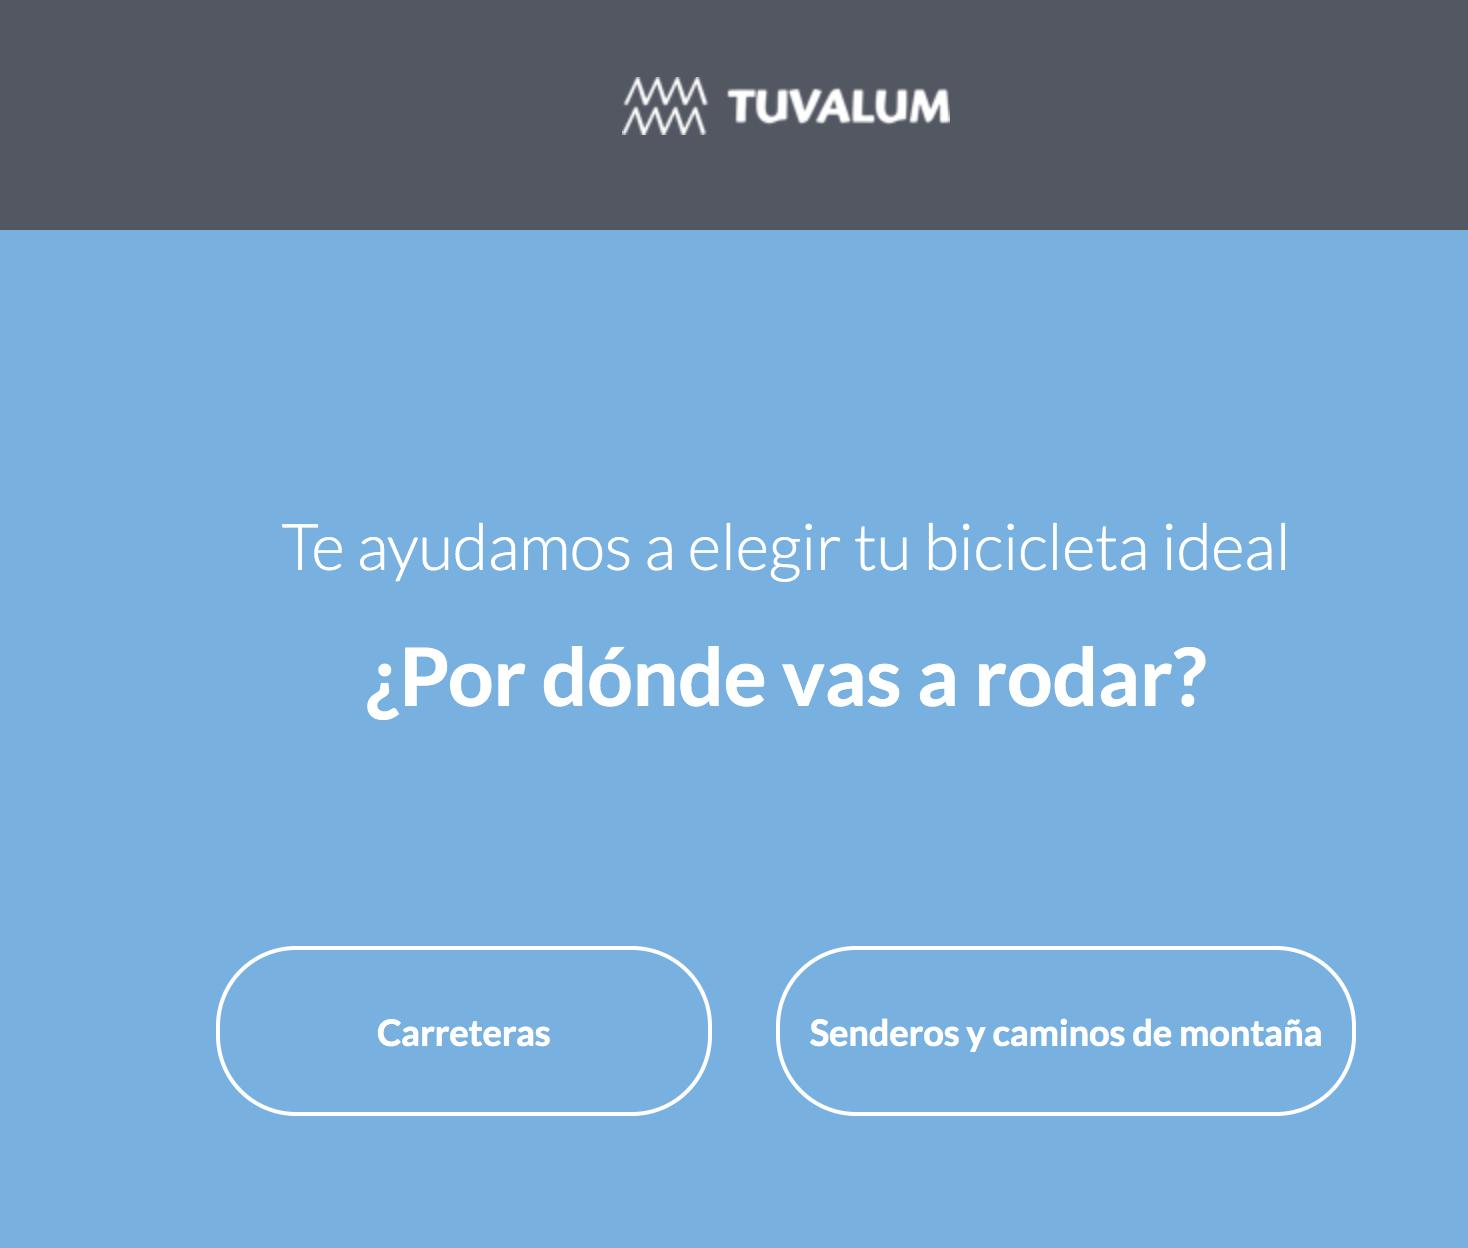 Tuvalum recomendador pantalla JoanSeguidor